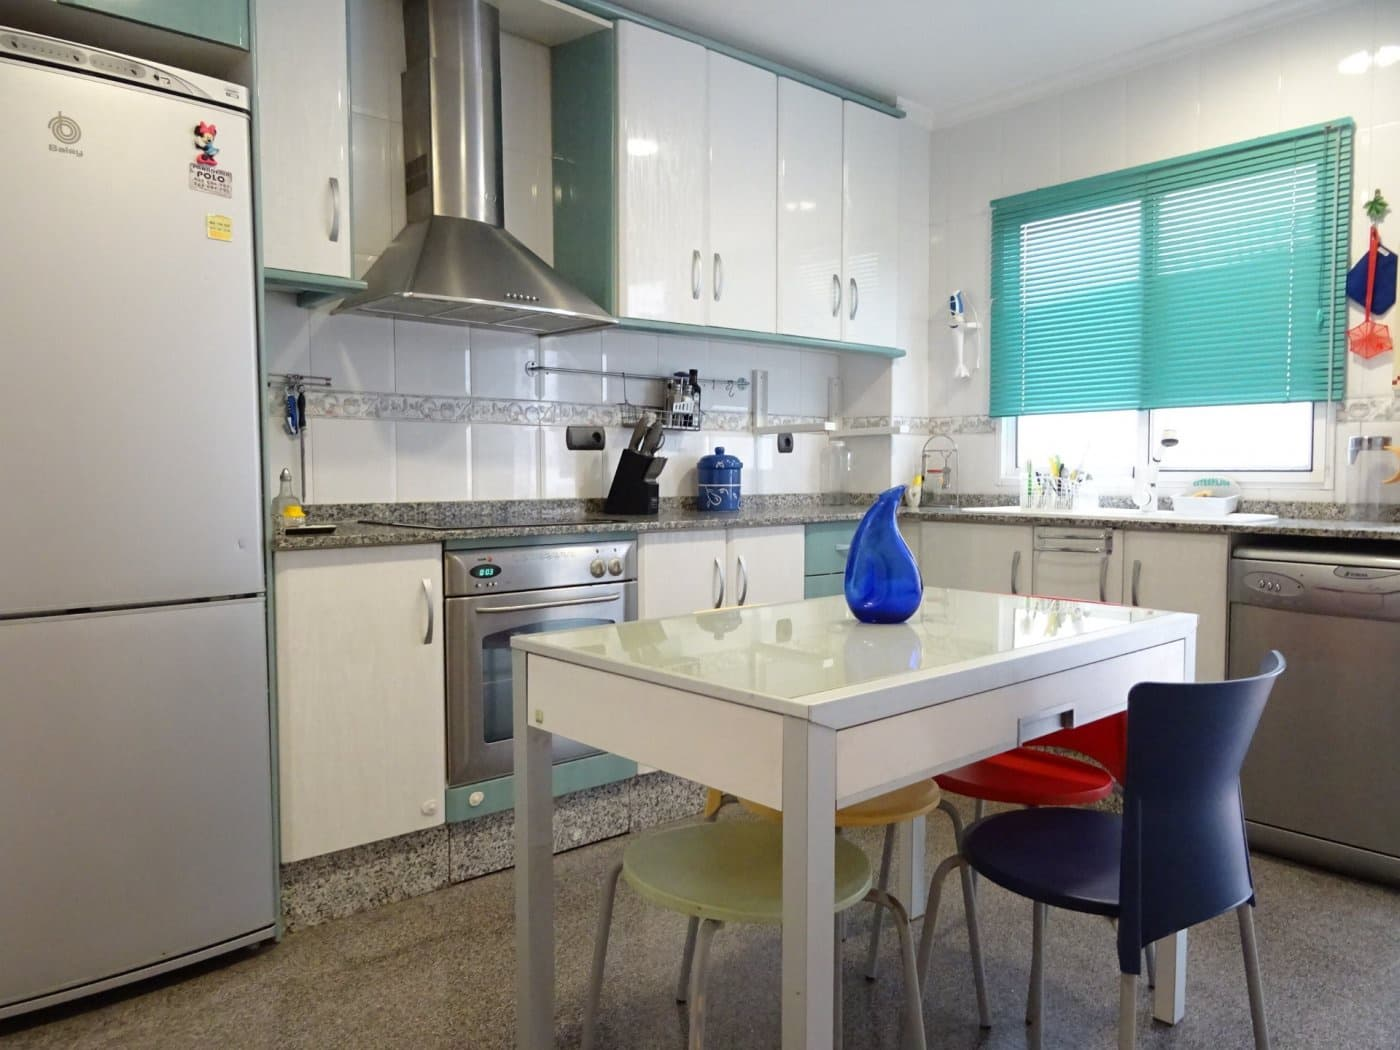 3 bedroom Bungalow for sale in Hondon de las Nieves with garage - € 137,260 (Ref: 6195728)